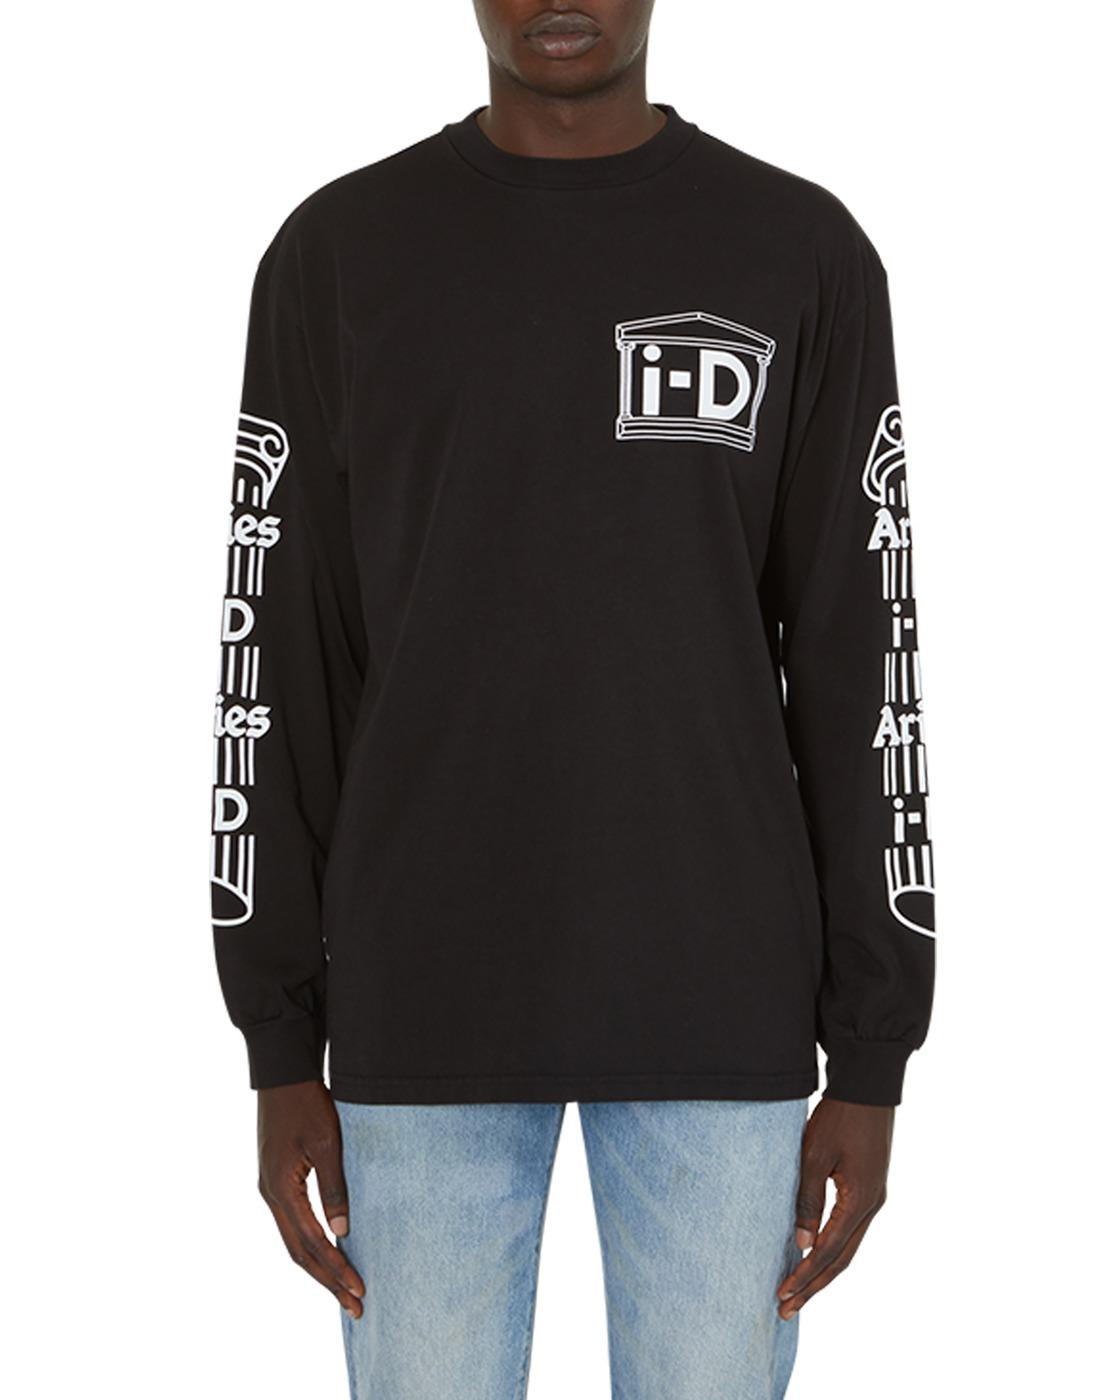 Aries I D Rat Long Sleeve T Shirt Black